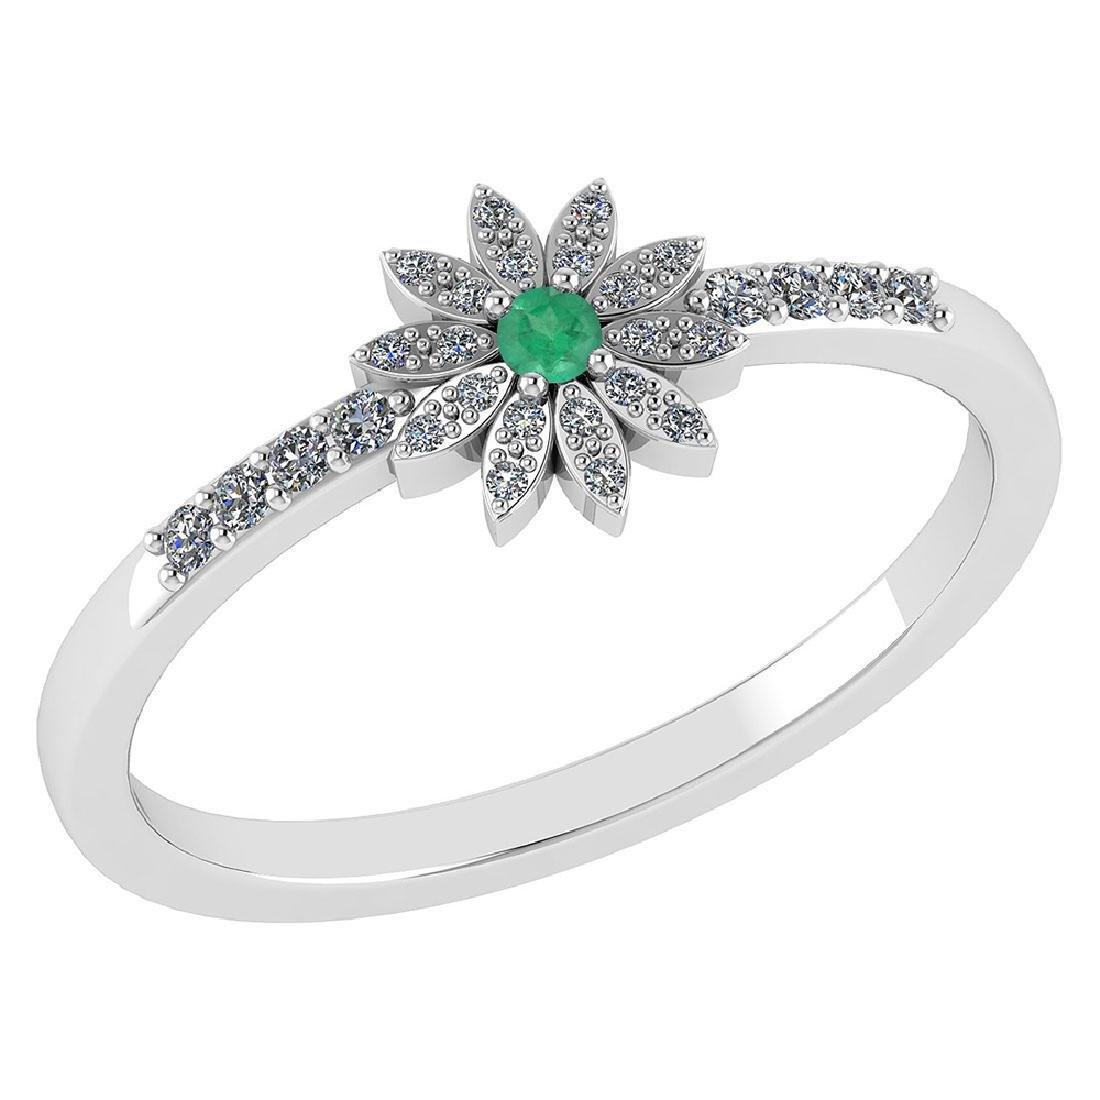 Certified .16 CTW Genuine Emerald And Diamond 14K White